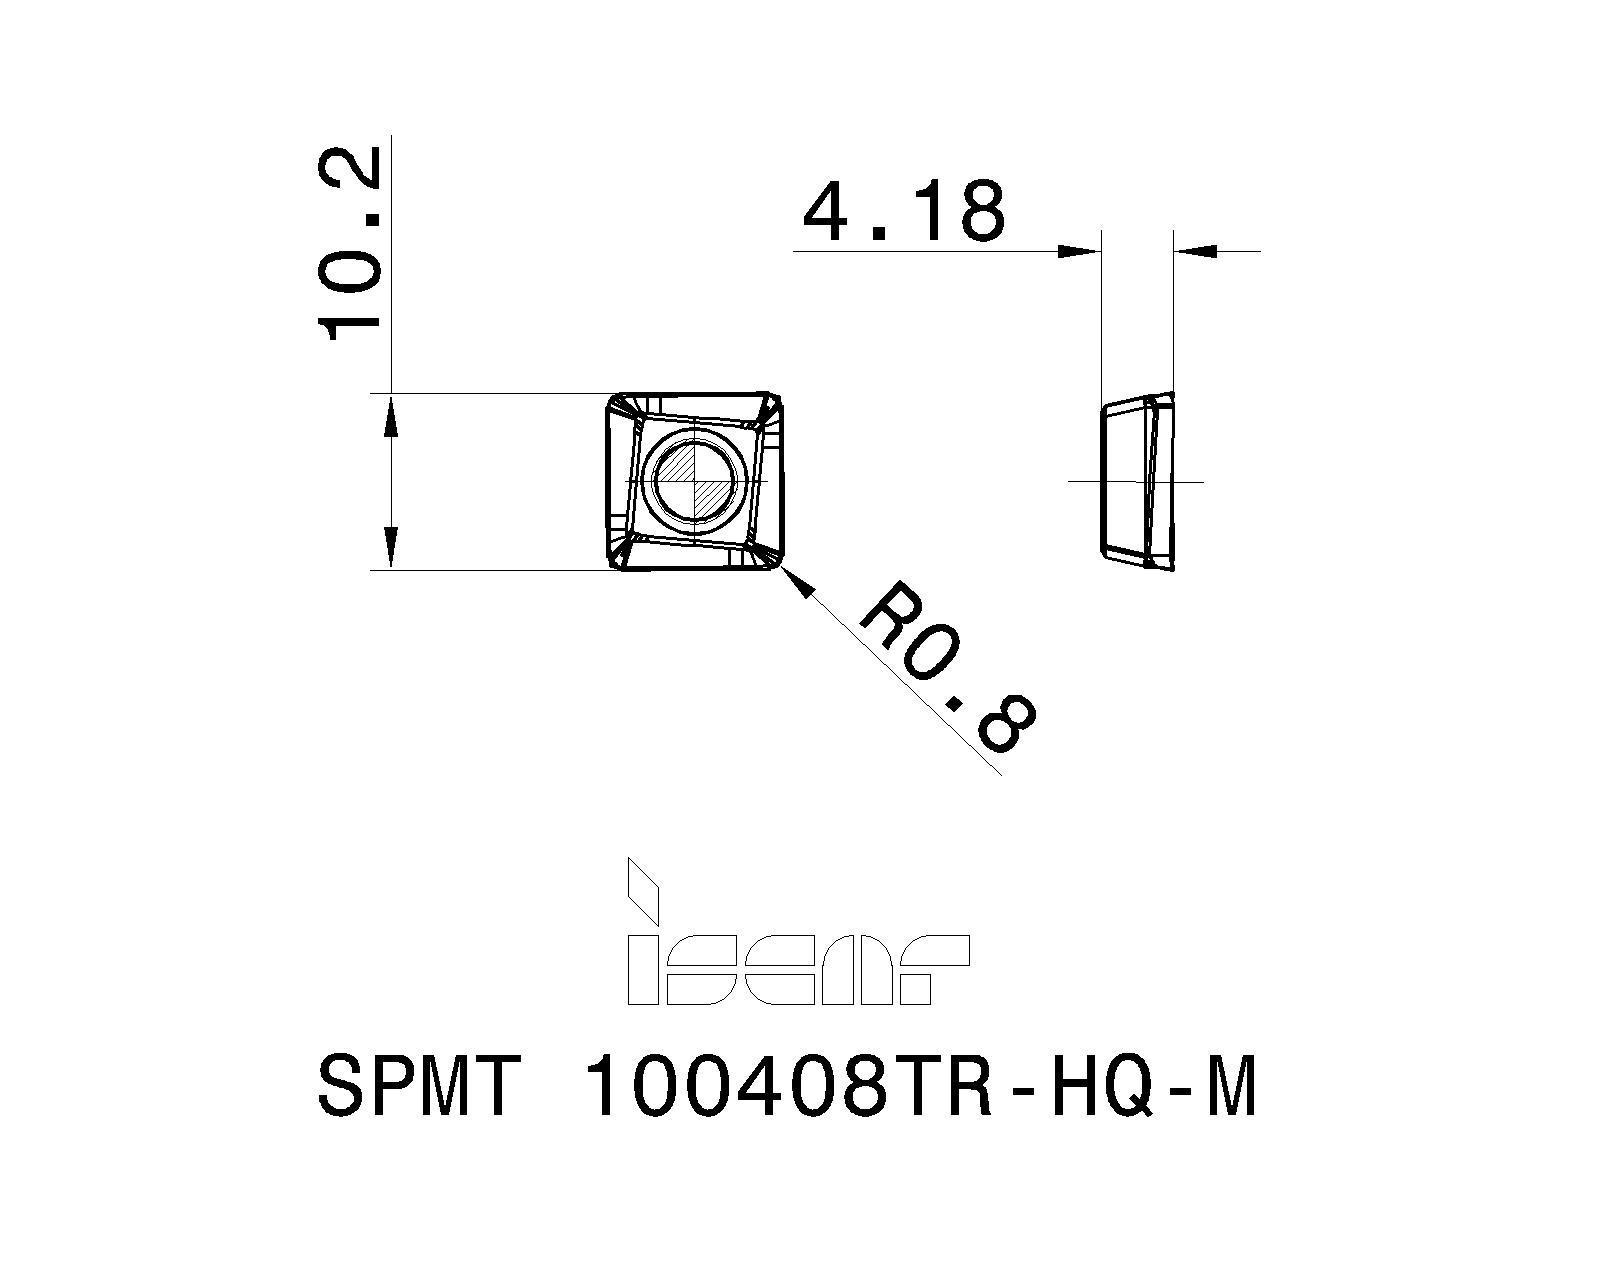 Iscar SPMT 100408TR-HQ-M IC908 Carbide Inserts 10Pc